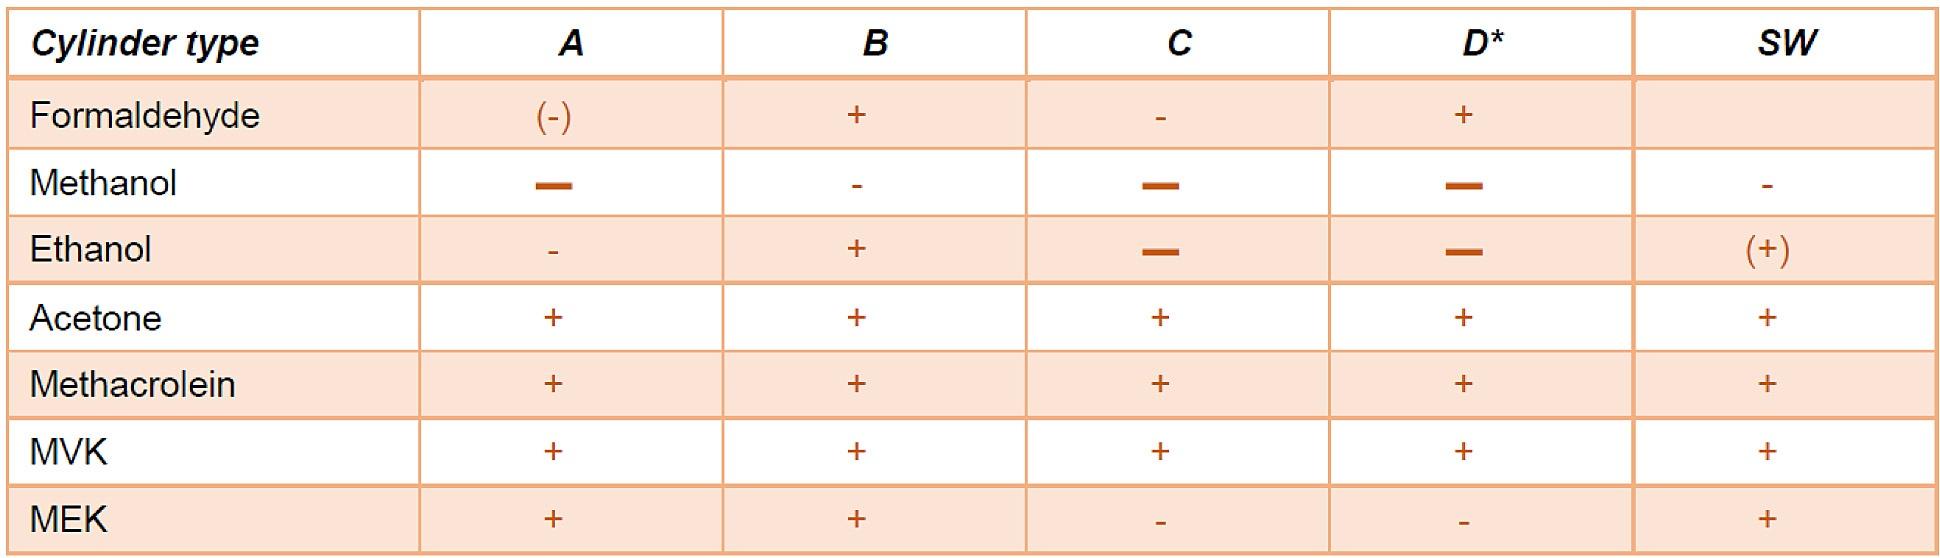 Sample cylinder VOC Analysis comparison 2